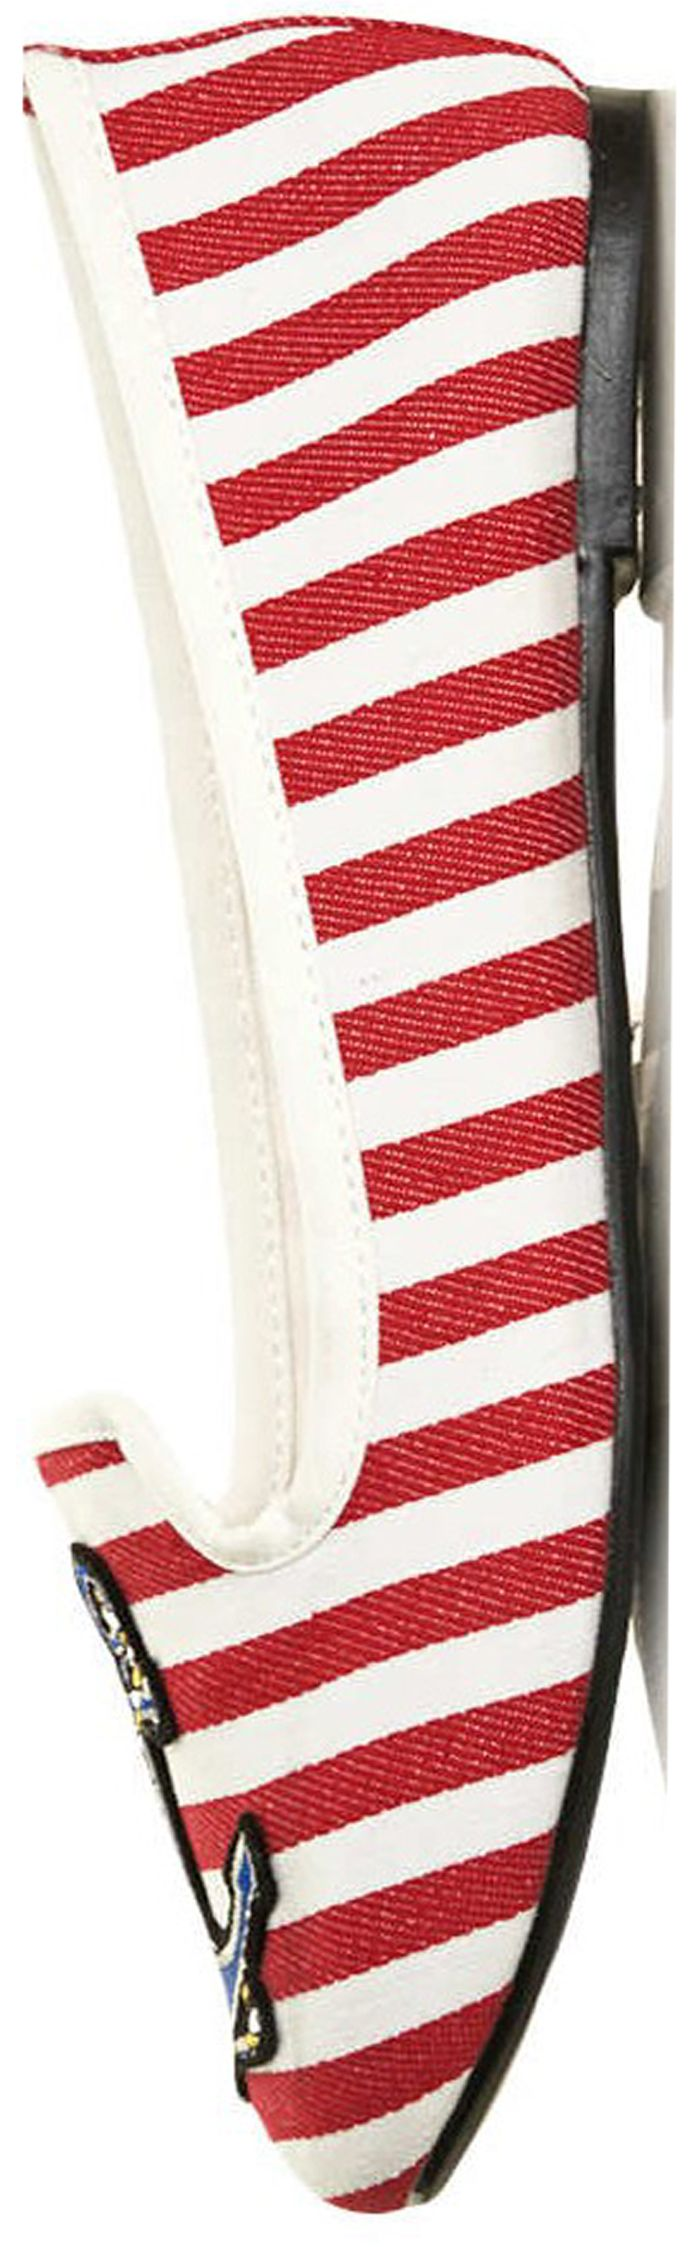 red and white striped nautical shoe #nautical #shoe #flats